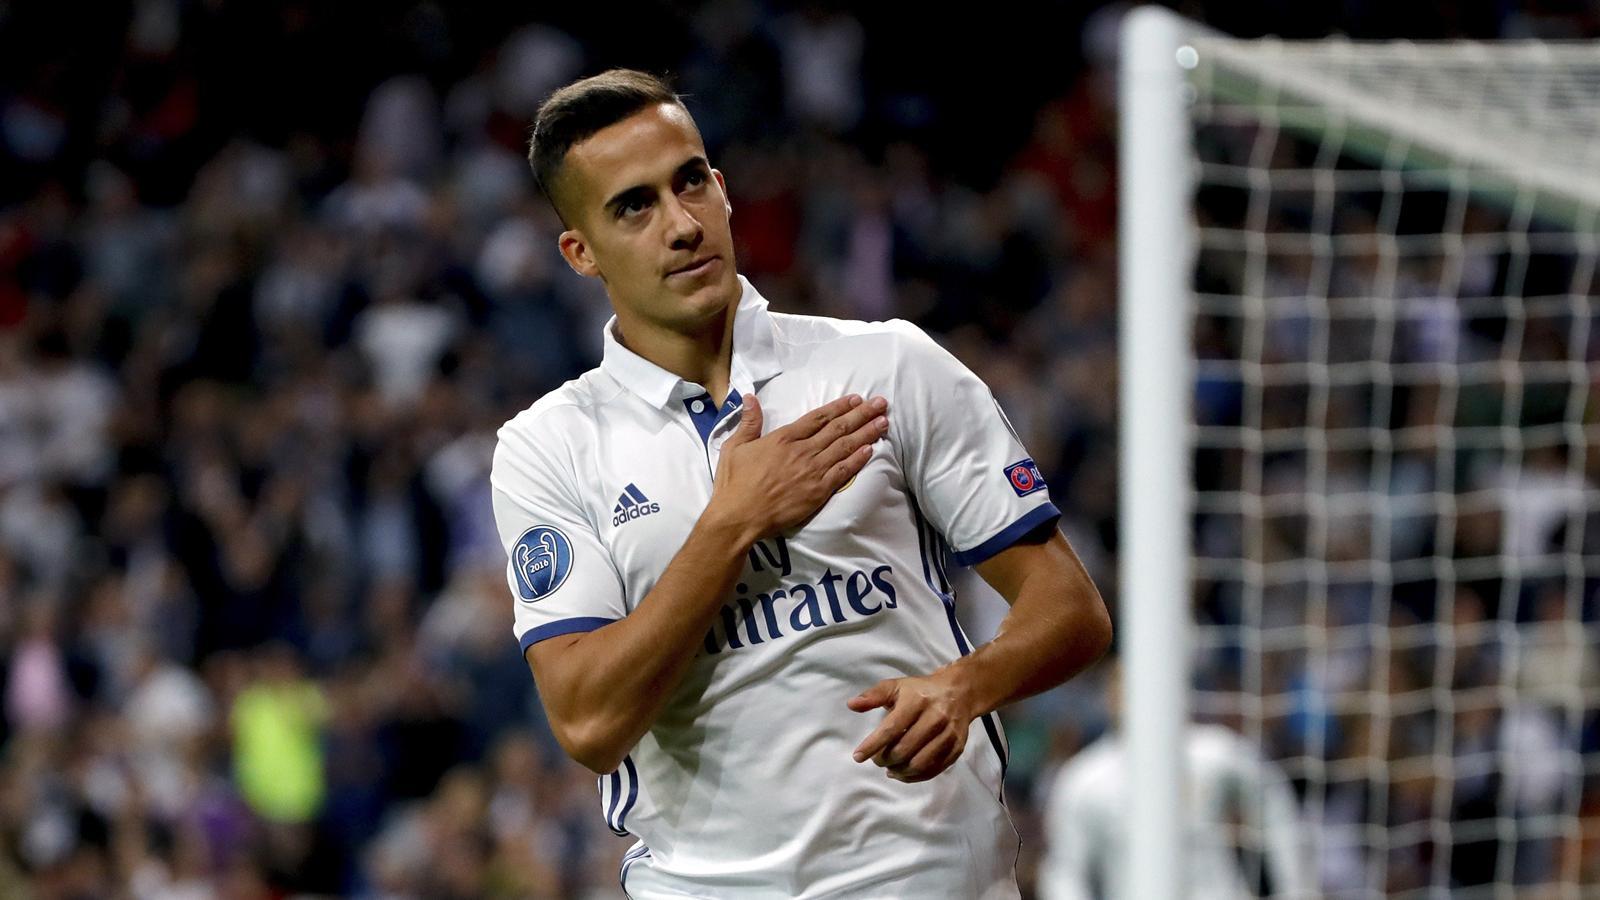 Real Madrid's Lucas Vazquez signs new contract - Liga 2016-2017 - Football - Eurosport